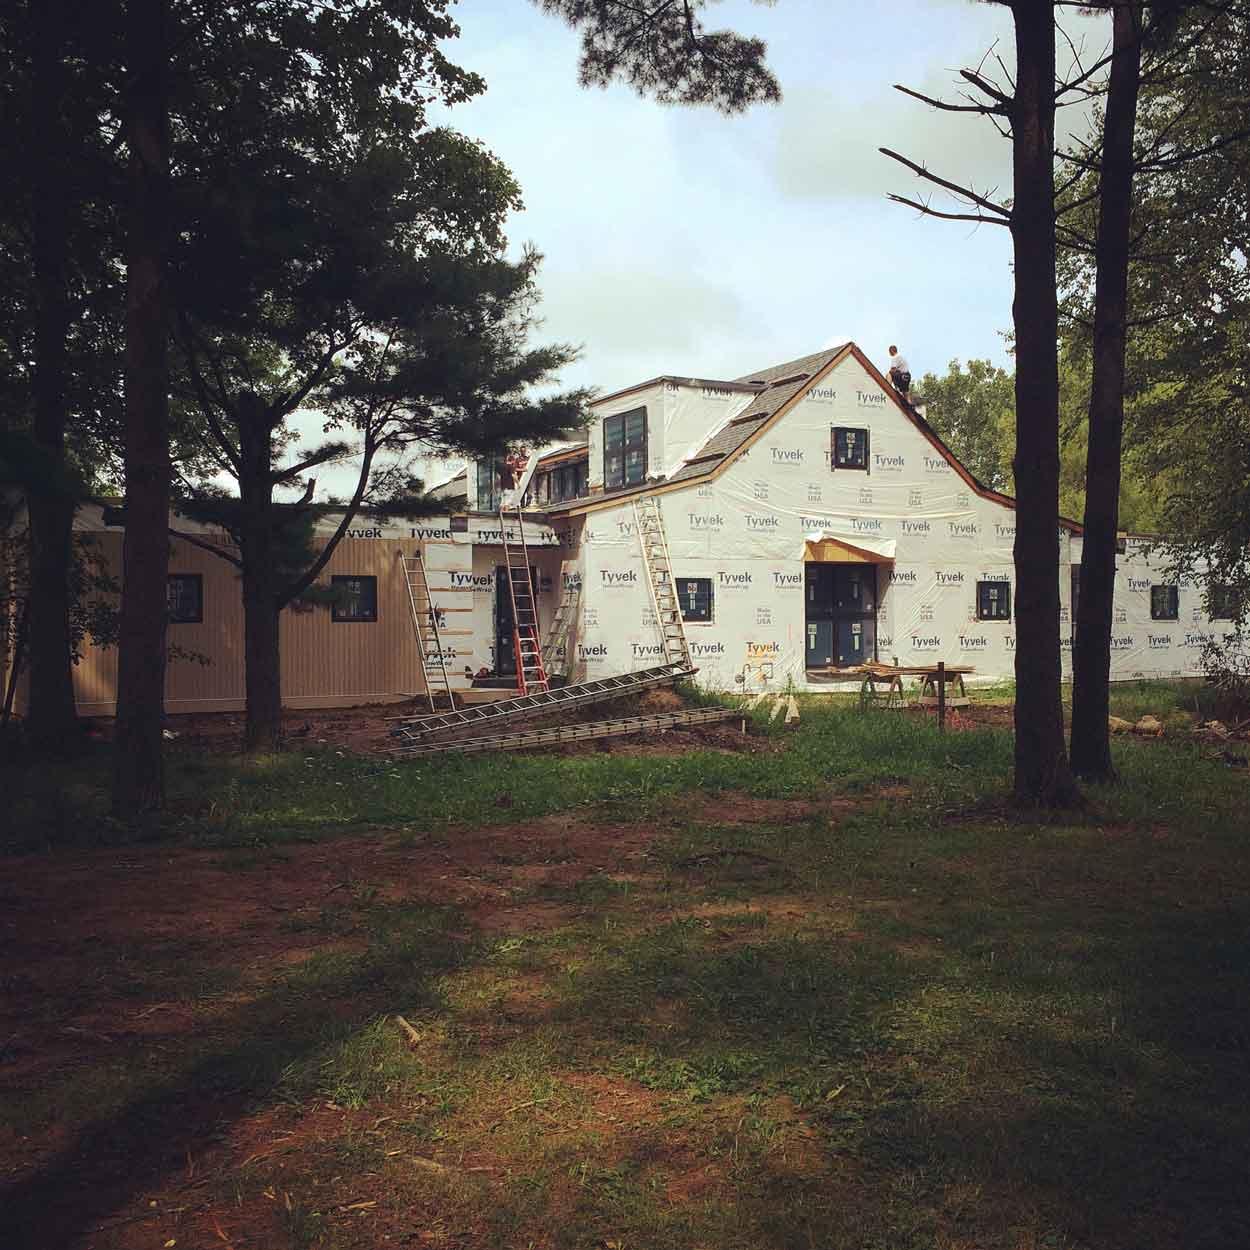 New Modern Farmhouse 3 - East Elevation Siding Underway